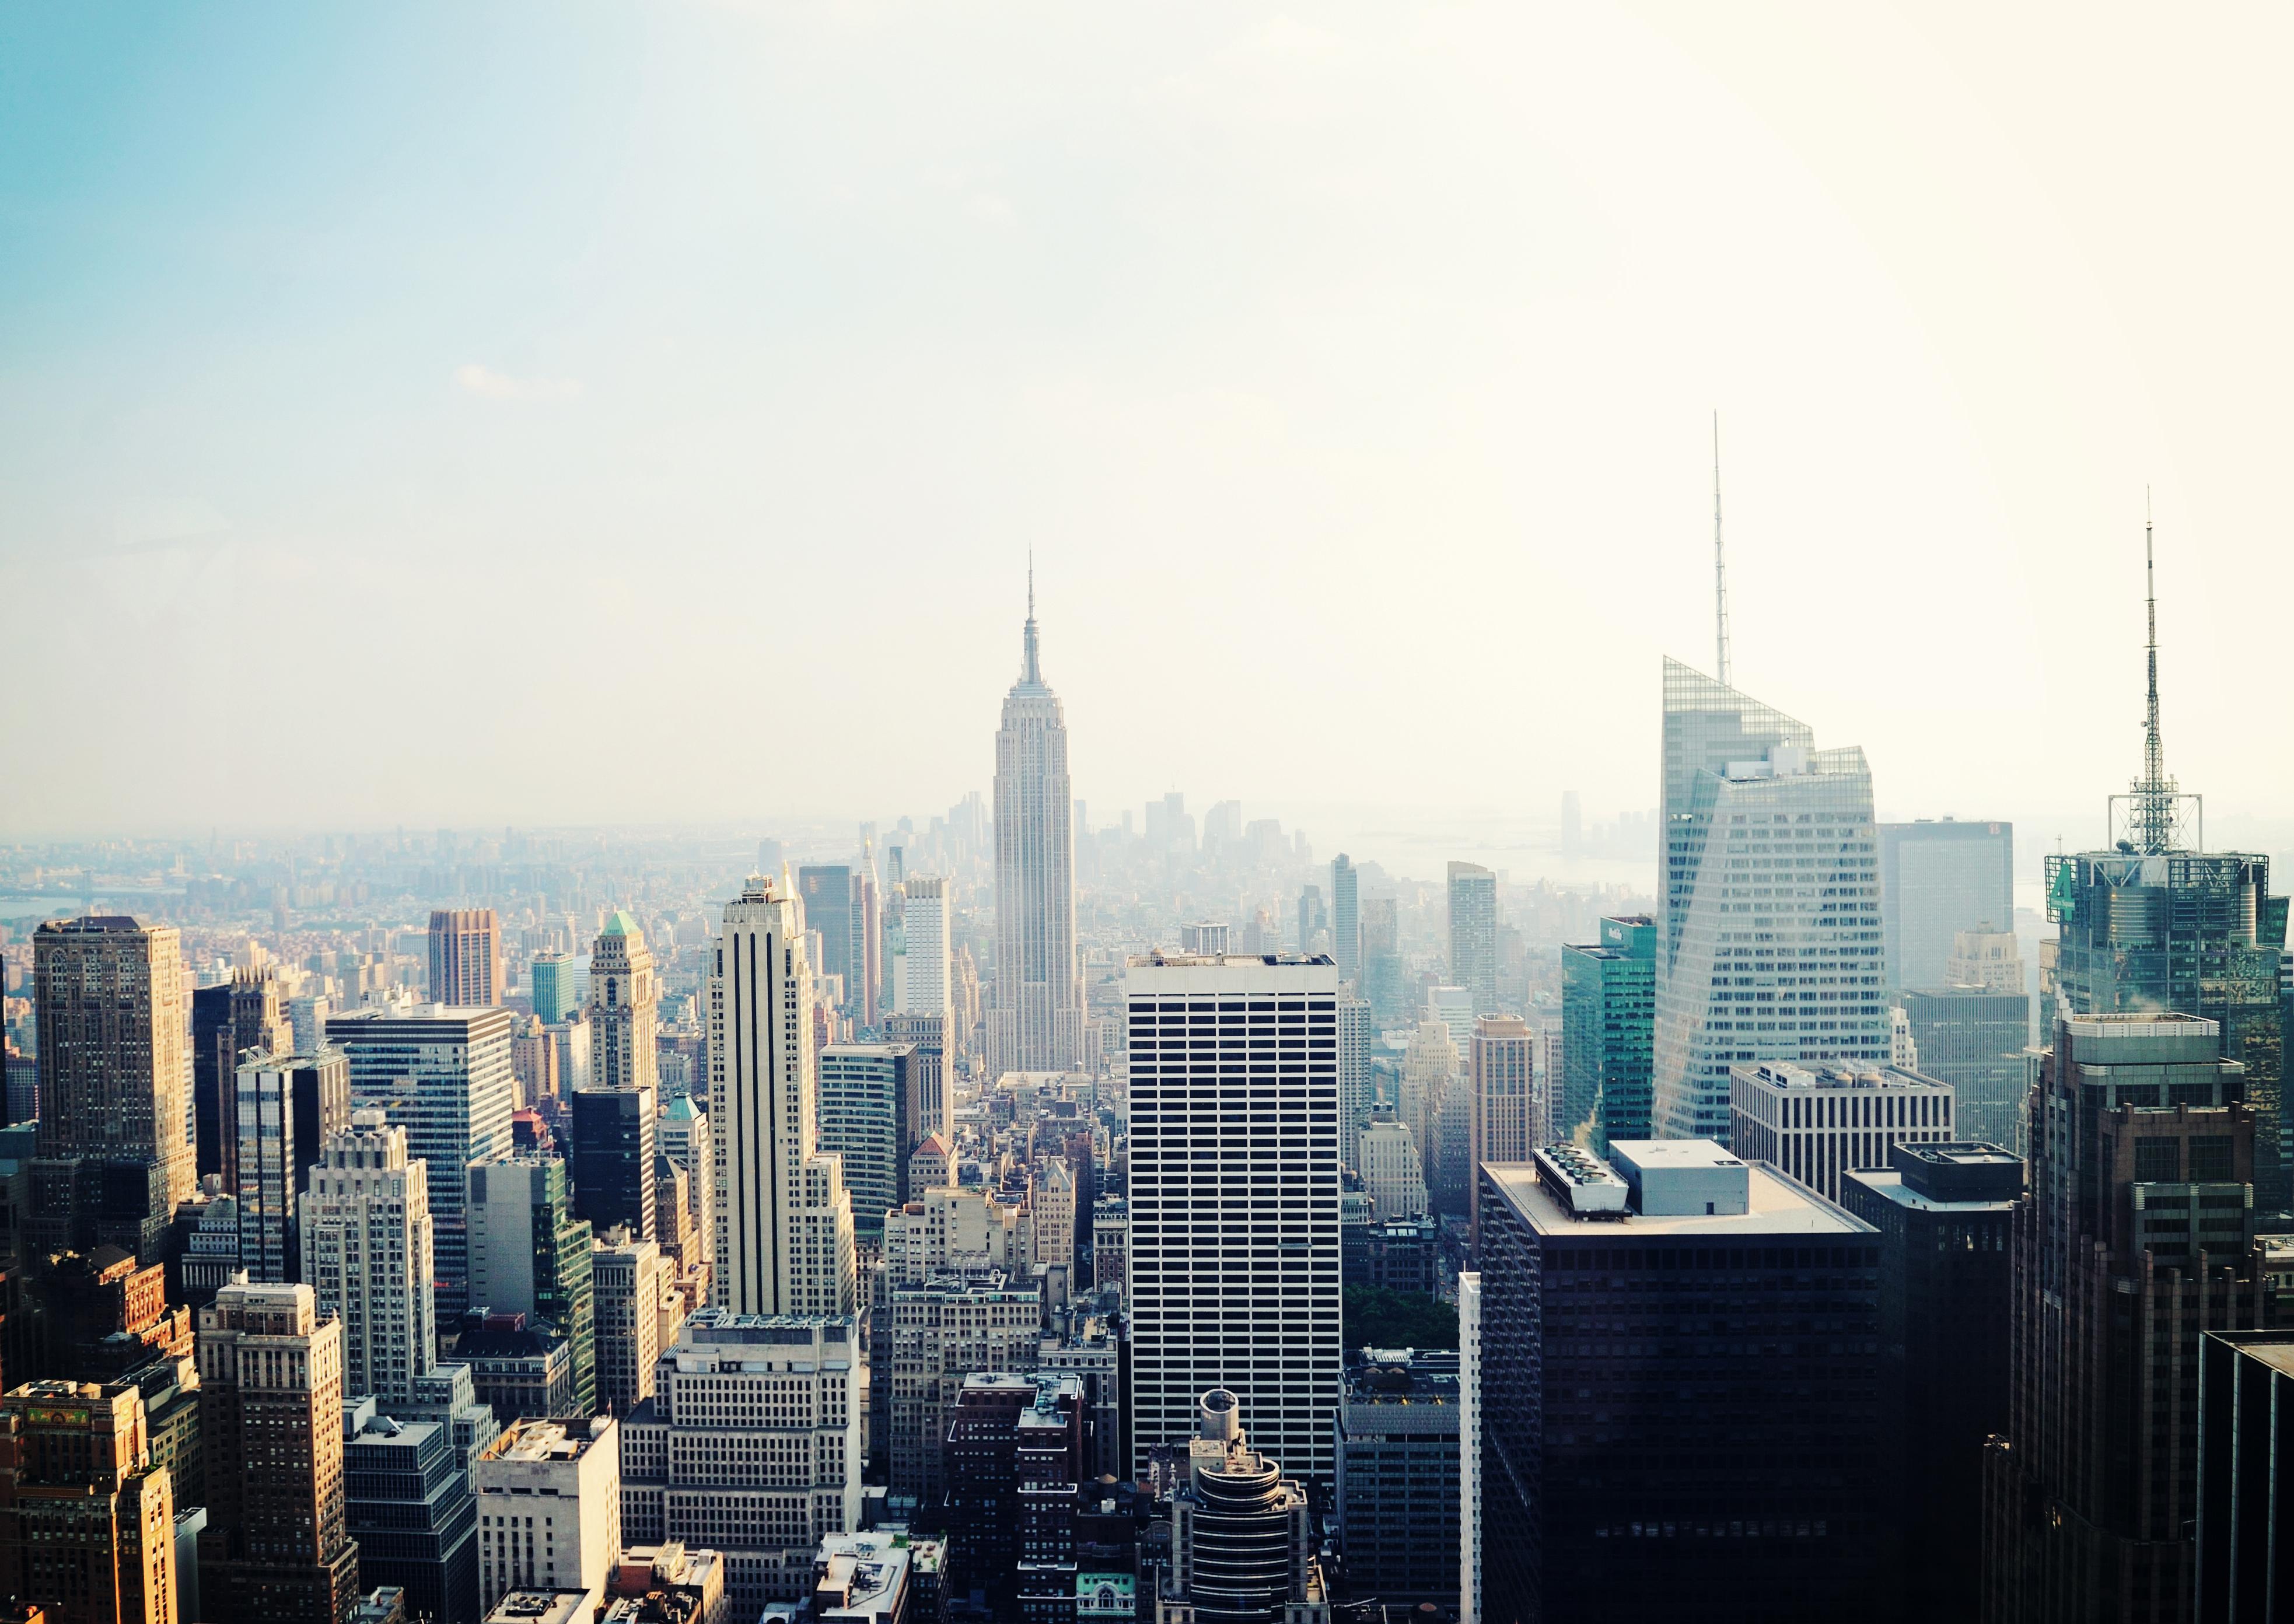 Город фото днем